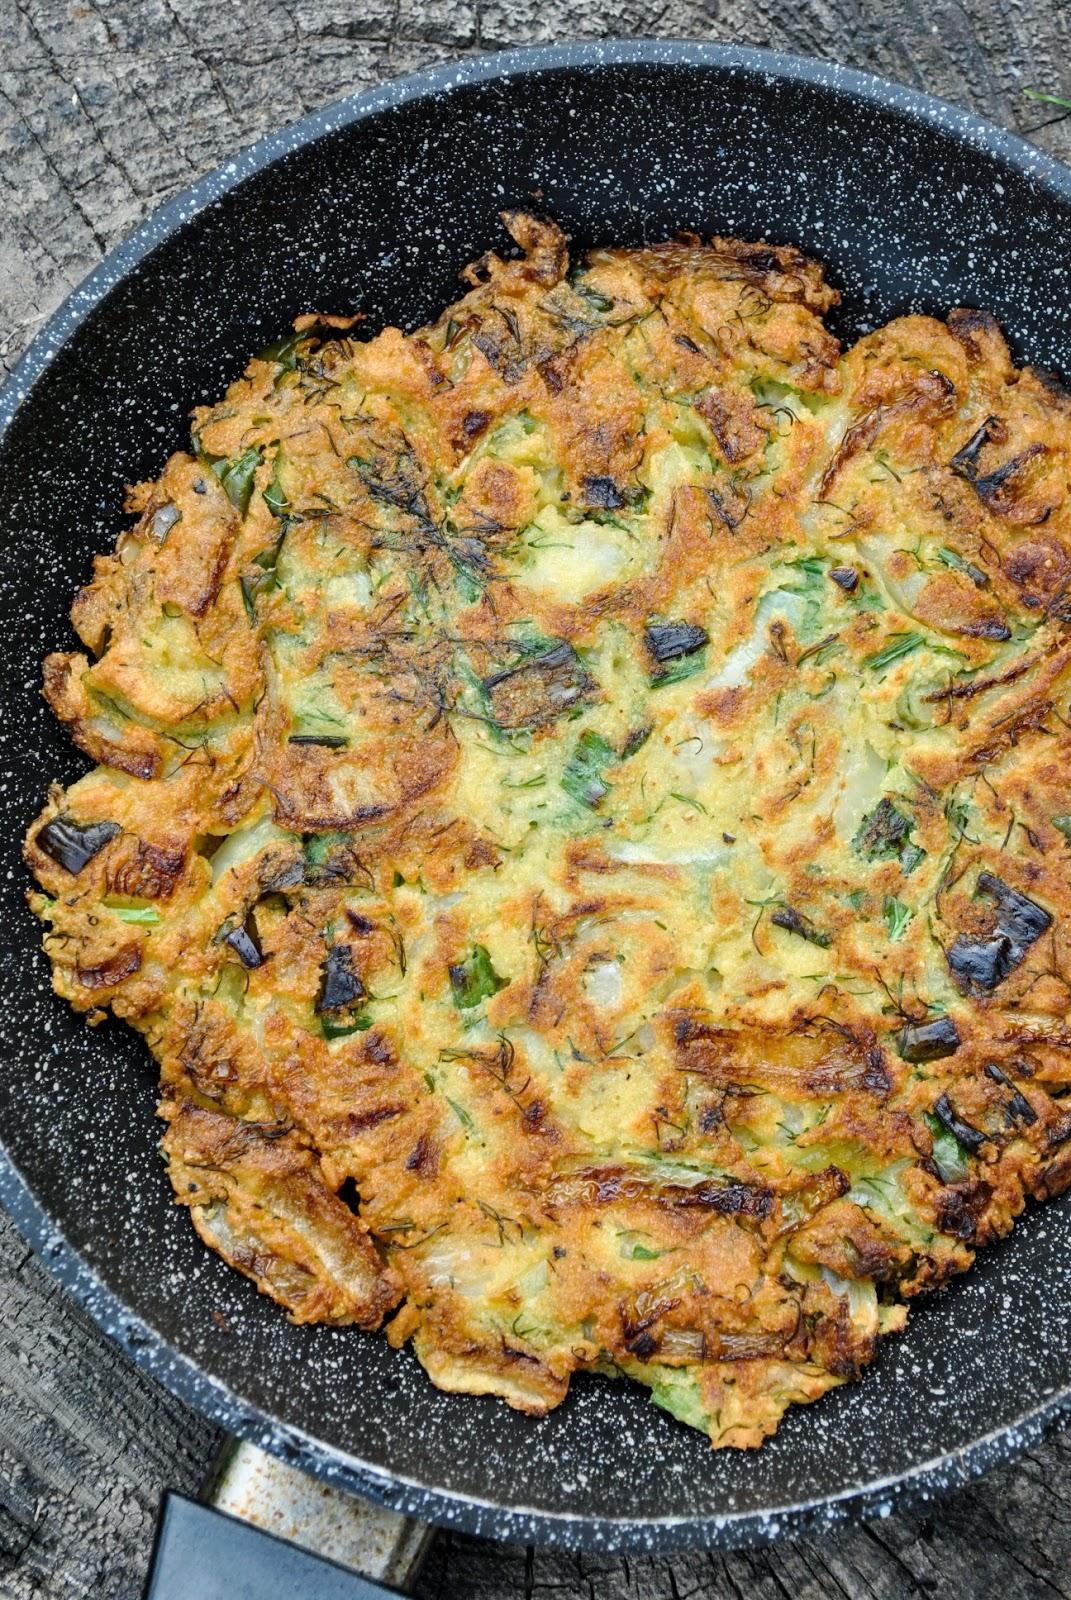 Chickpea omlettes